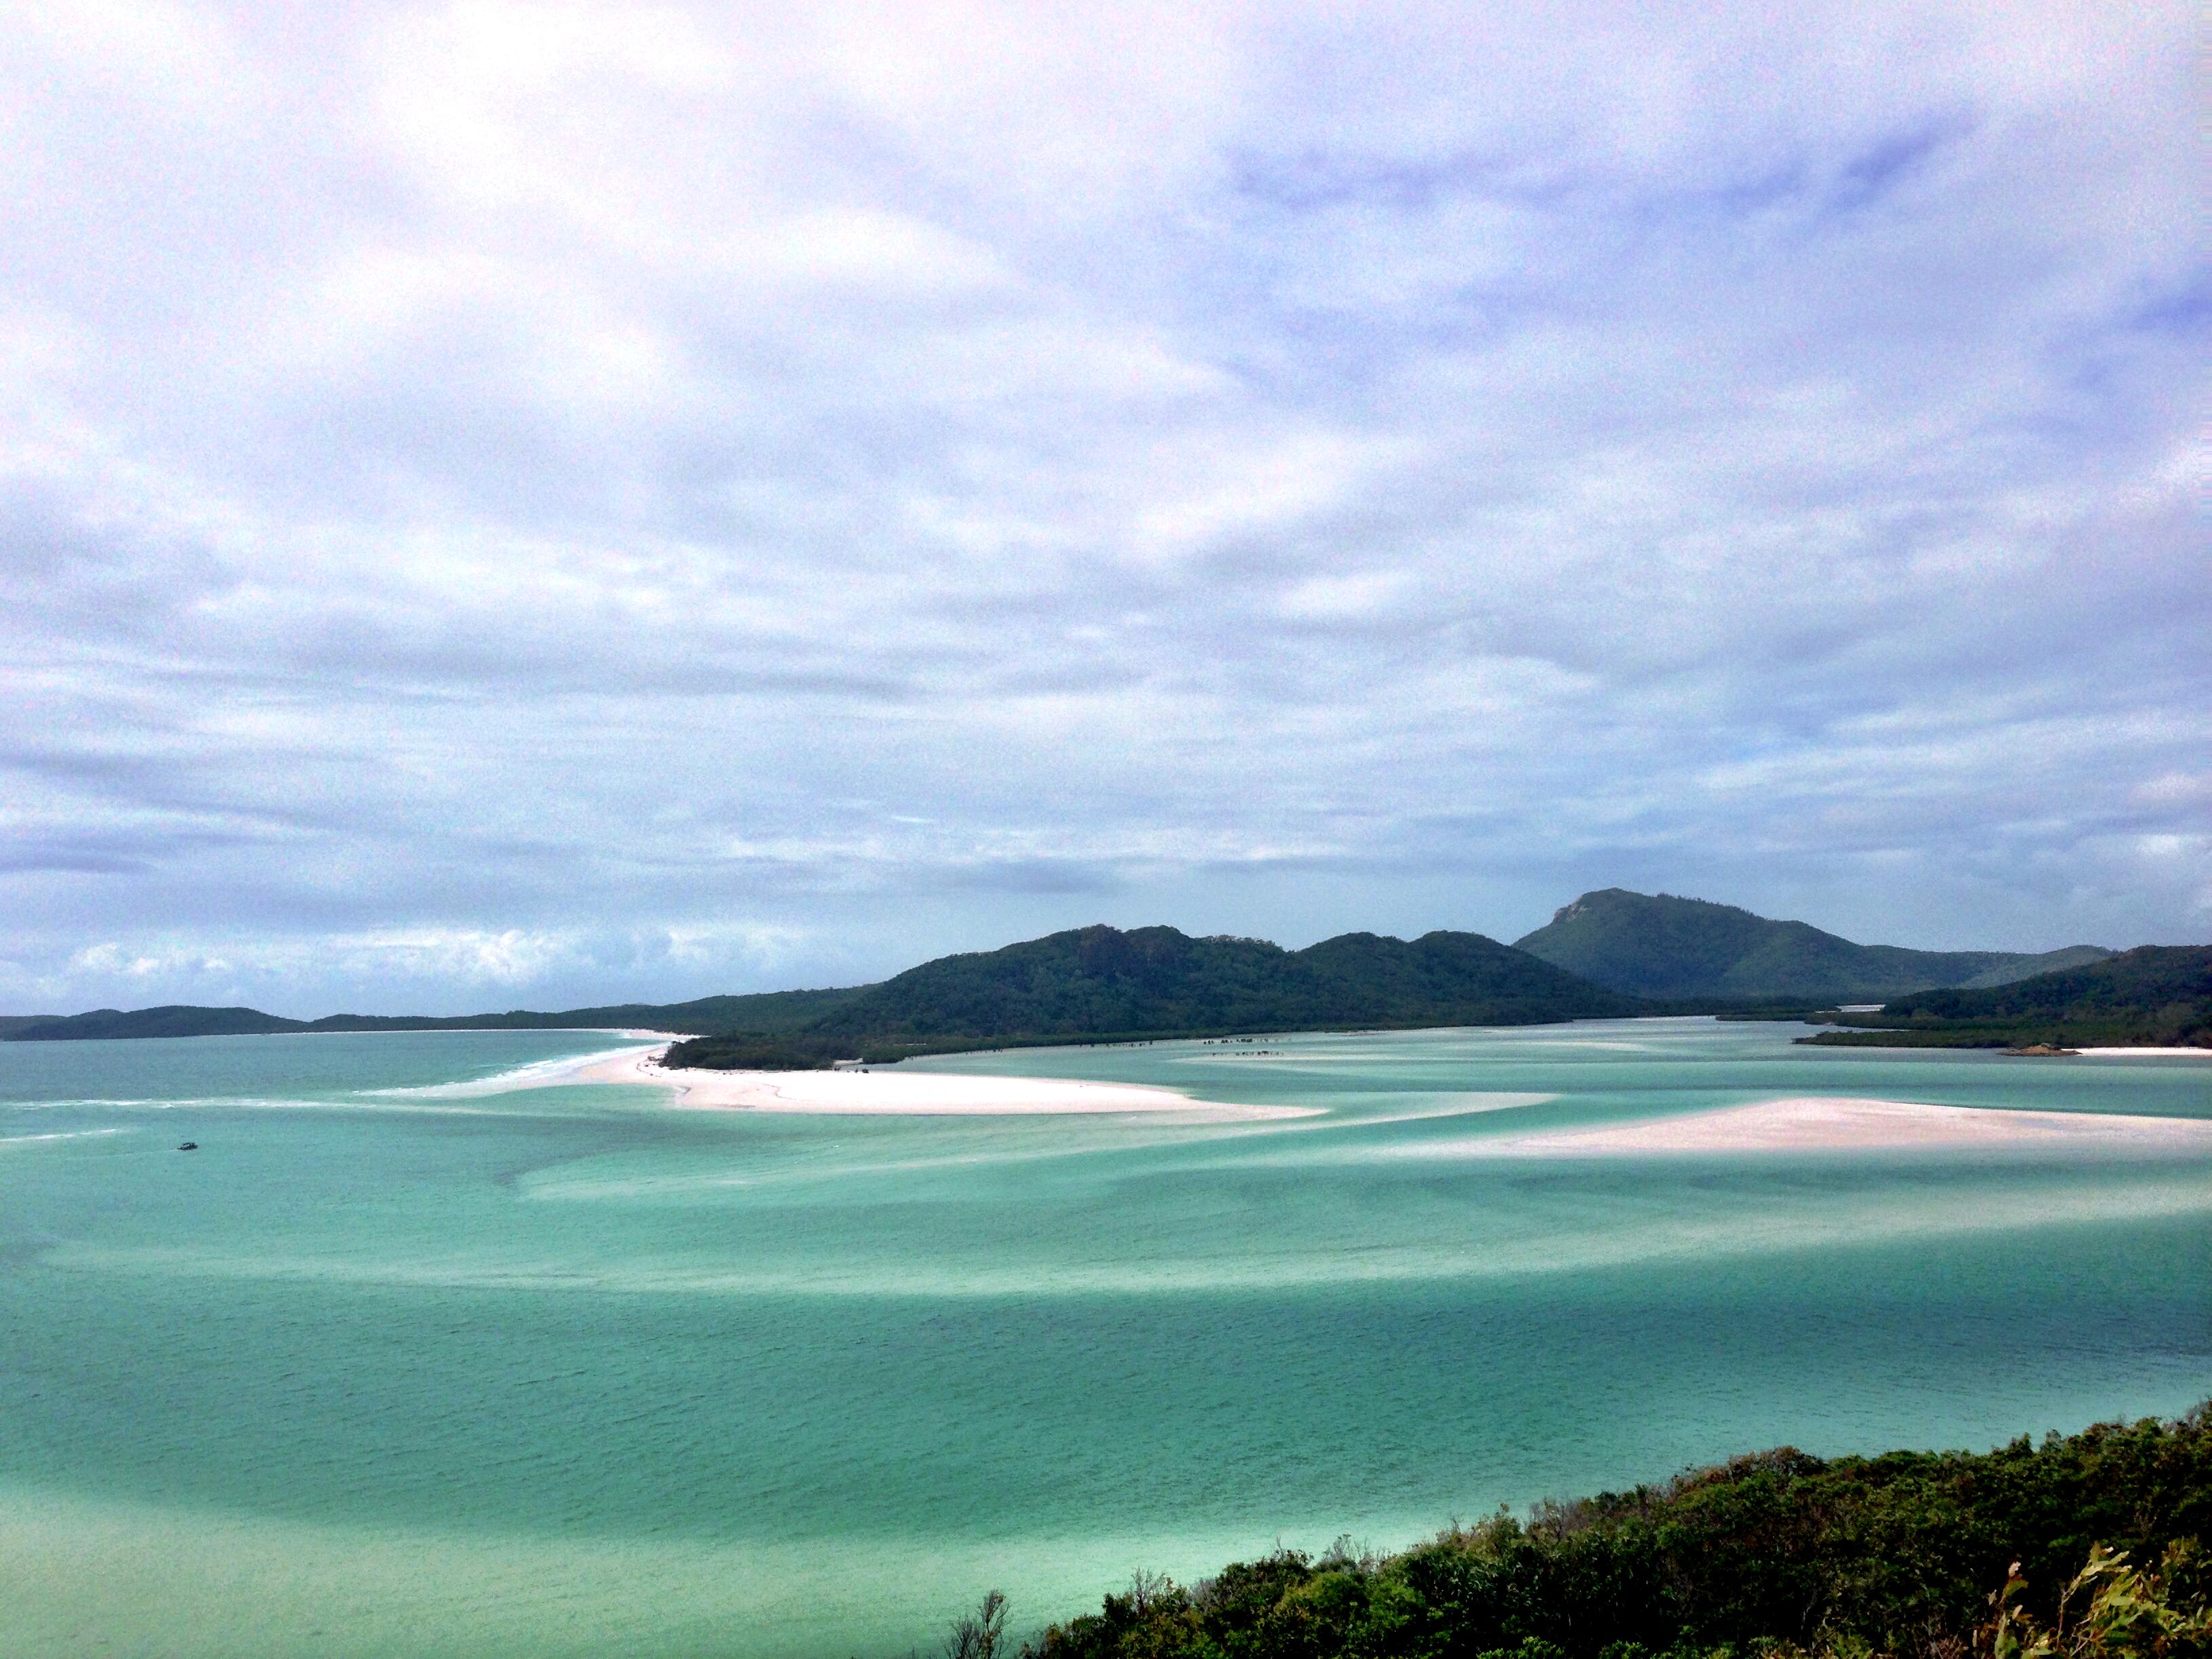 Whitehaven Beach - Whitsundays in Australia